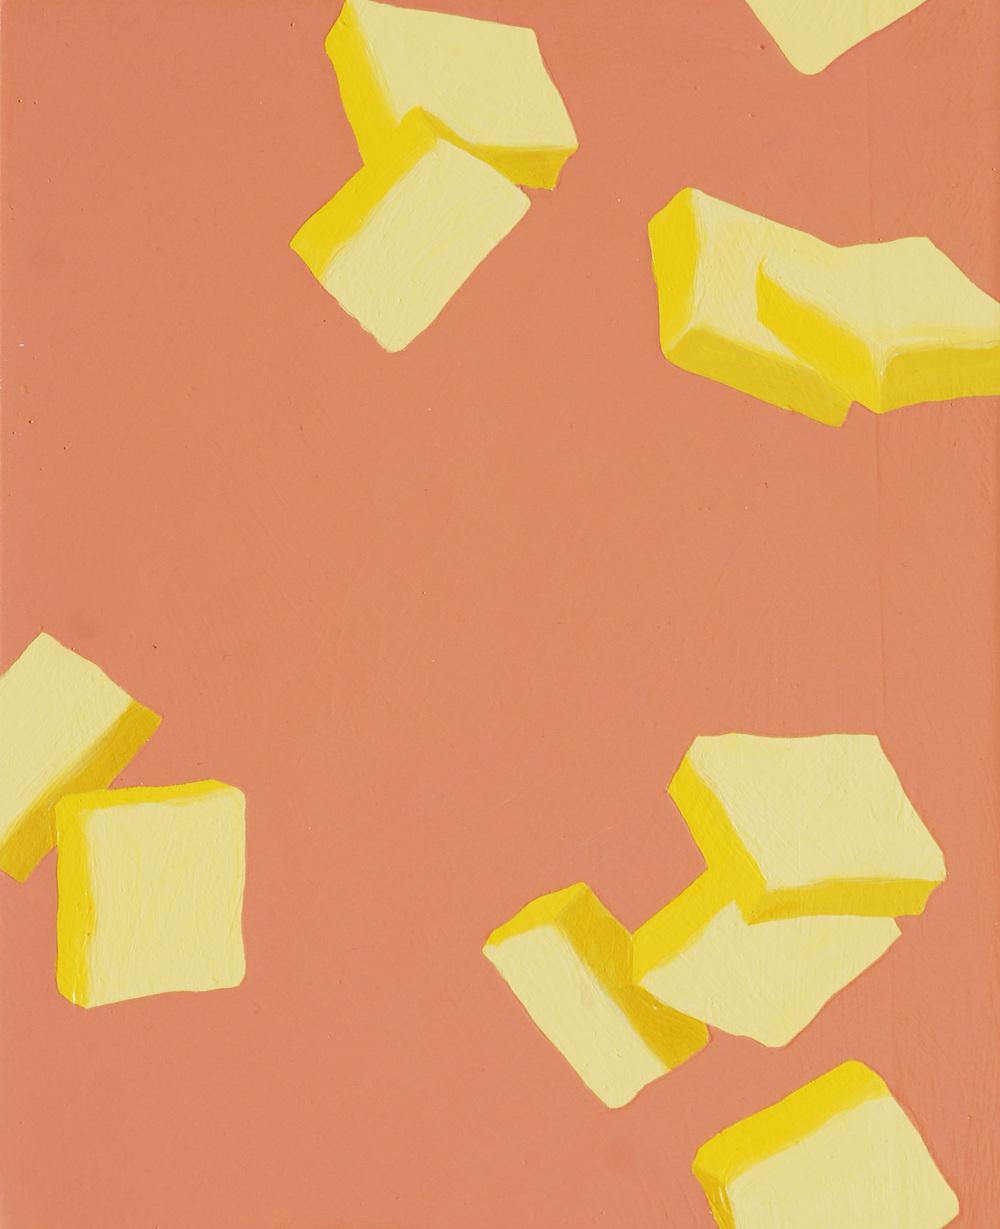 08_butter-falling.jpg